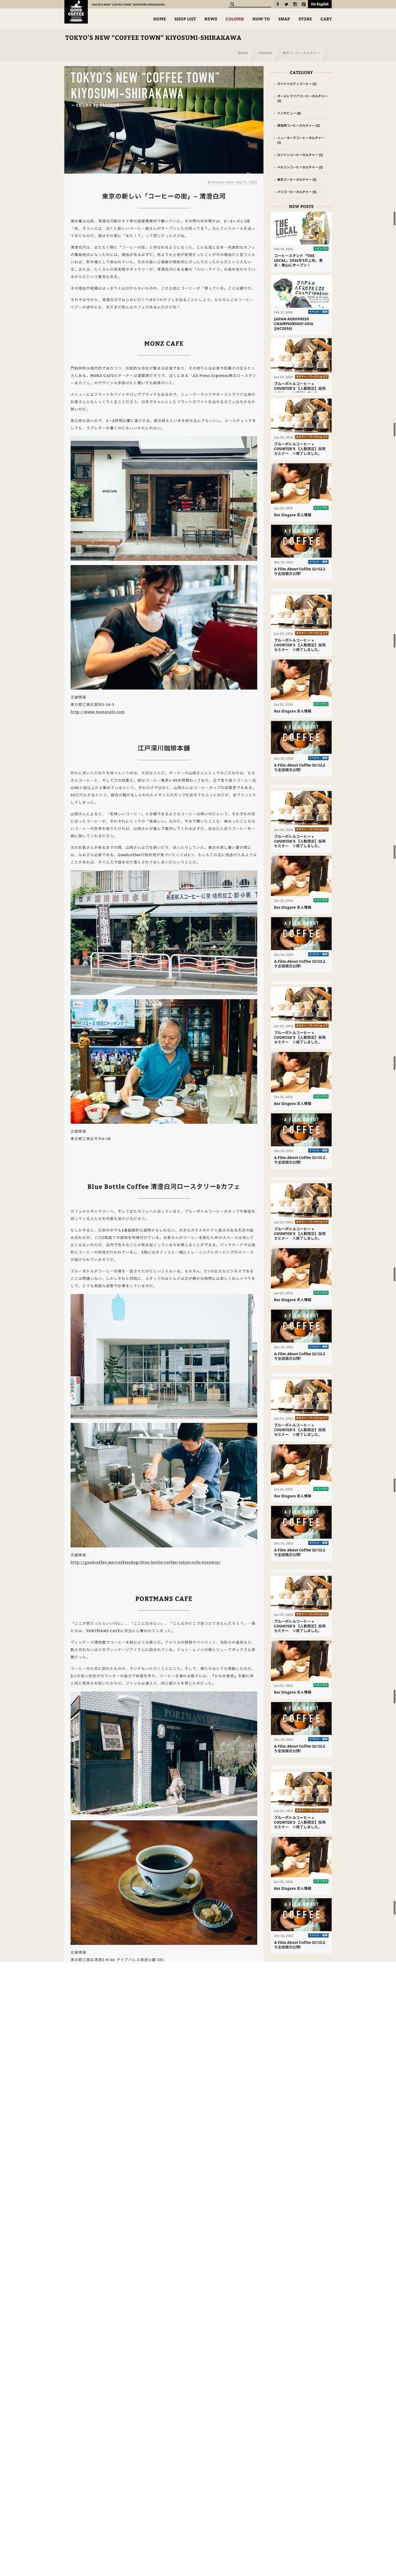 http://goodcoffee.me/column/tokyo-coffee-culture/tokyos-new-coffee-town-kiyosumi-shirakawa/